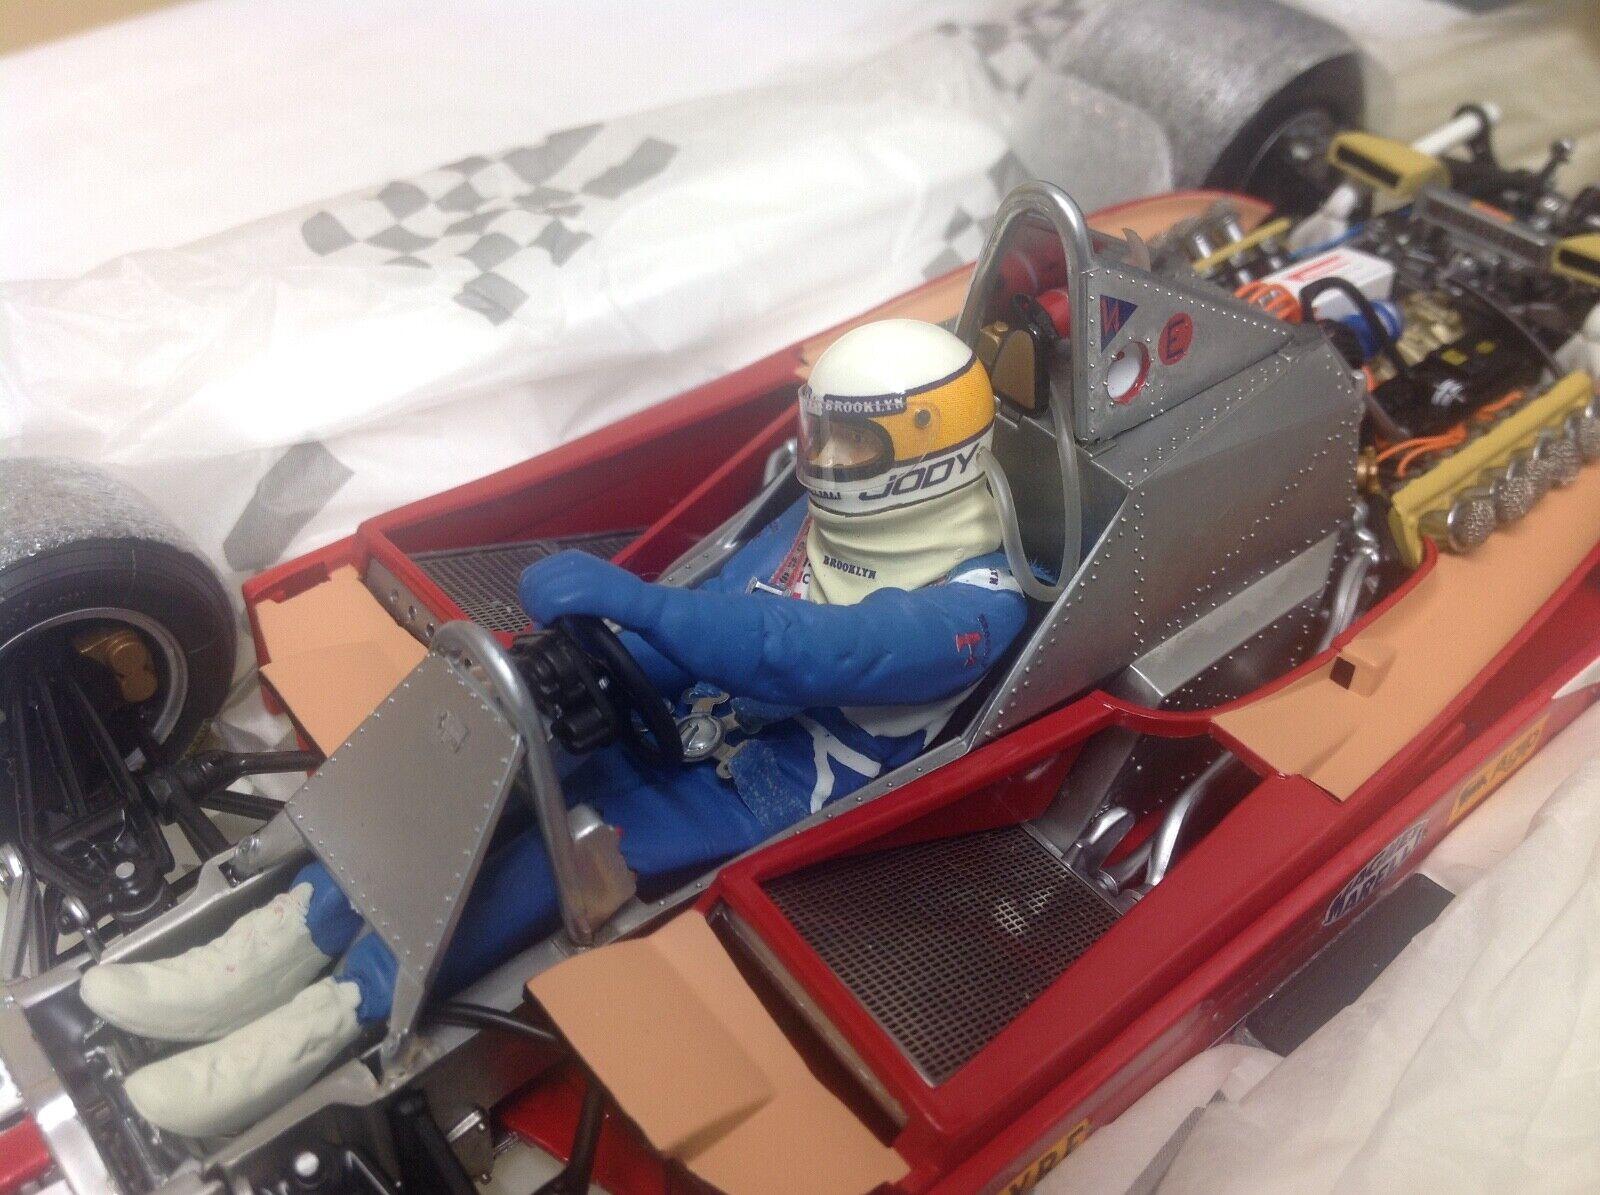 Exoto ferrari 312 t4 jody scheckter 1979 winner Bélgica gp 1 18 nuevo 97072